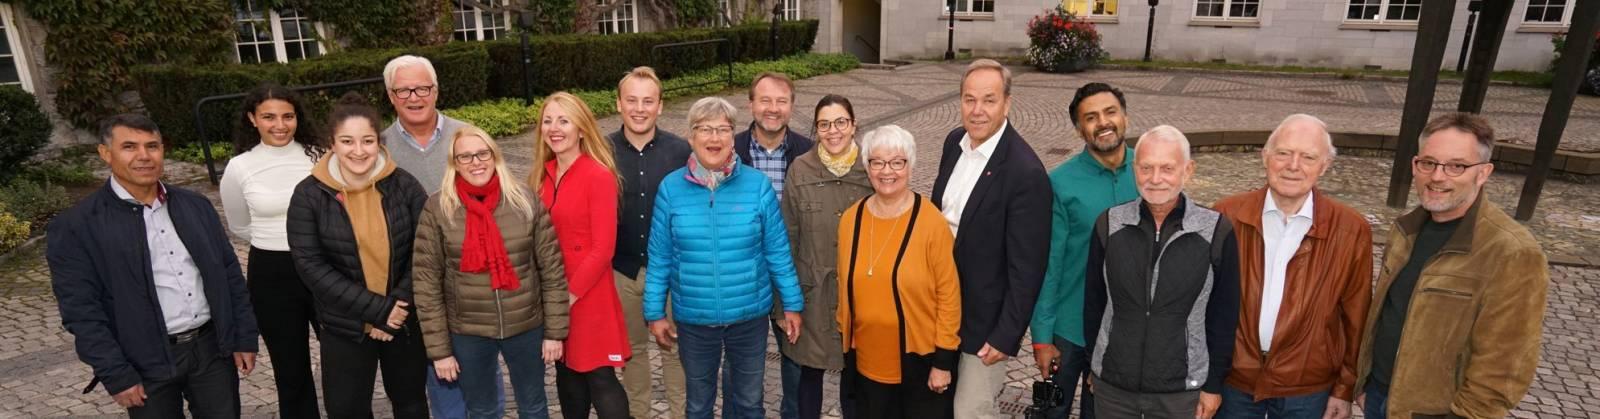 Kommunestyregruppen på Rådhusplassen i Bærum